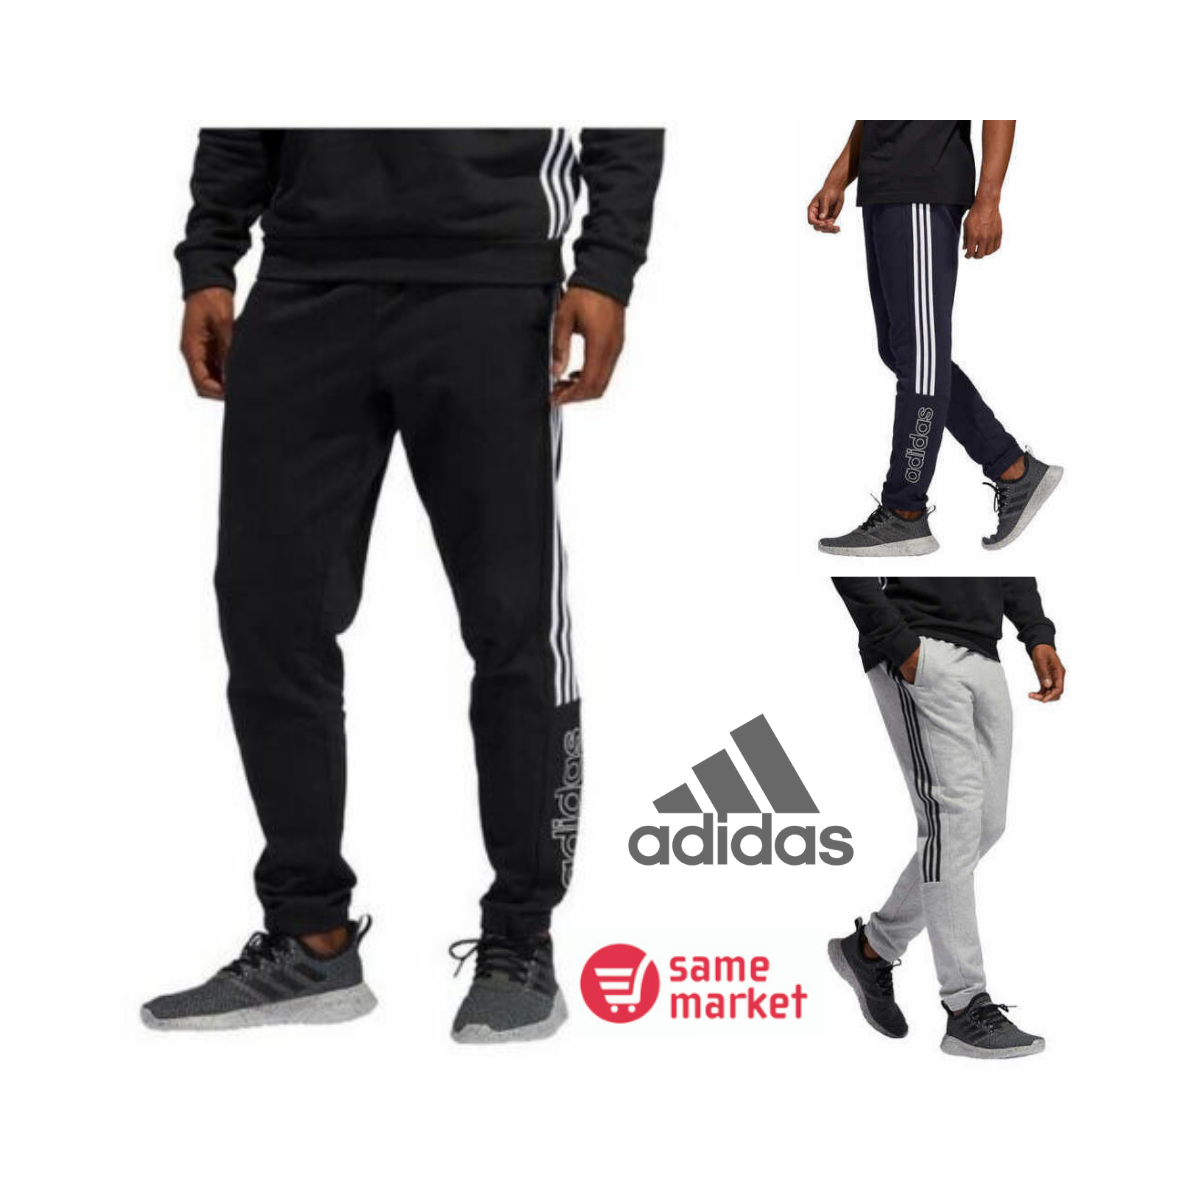 NEW!!! adidas Men's Sereno 19 Training Pants Size & Color VA